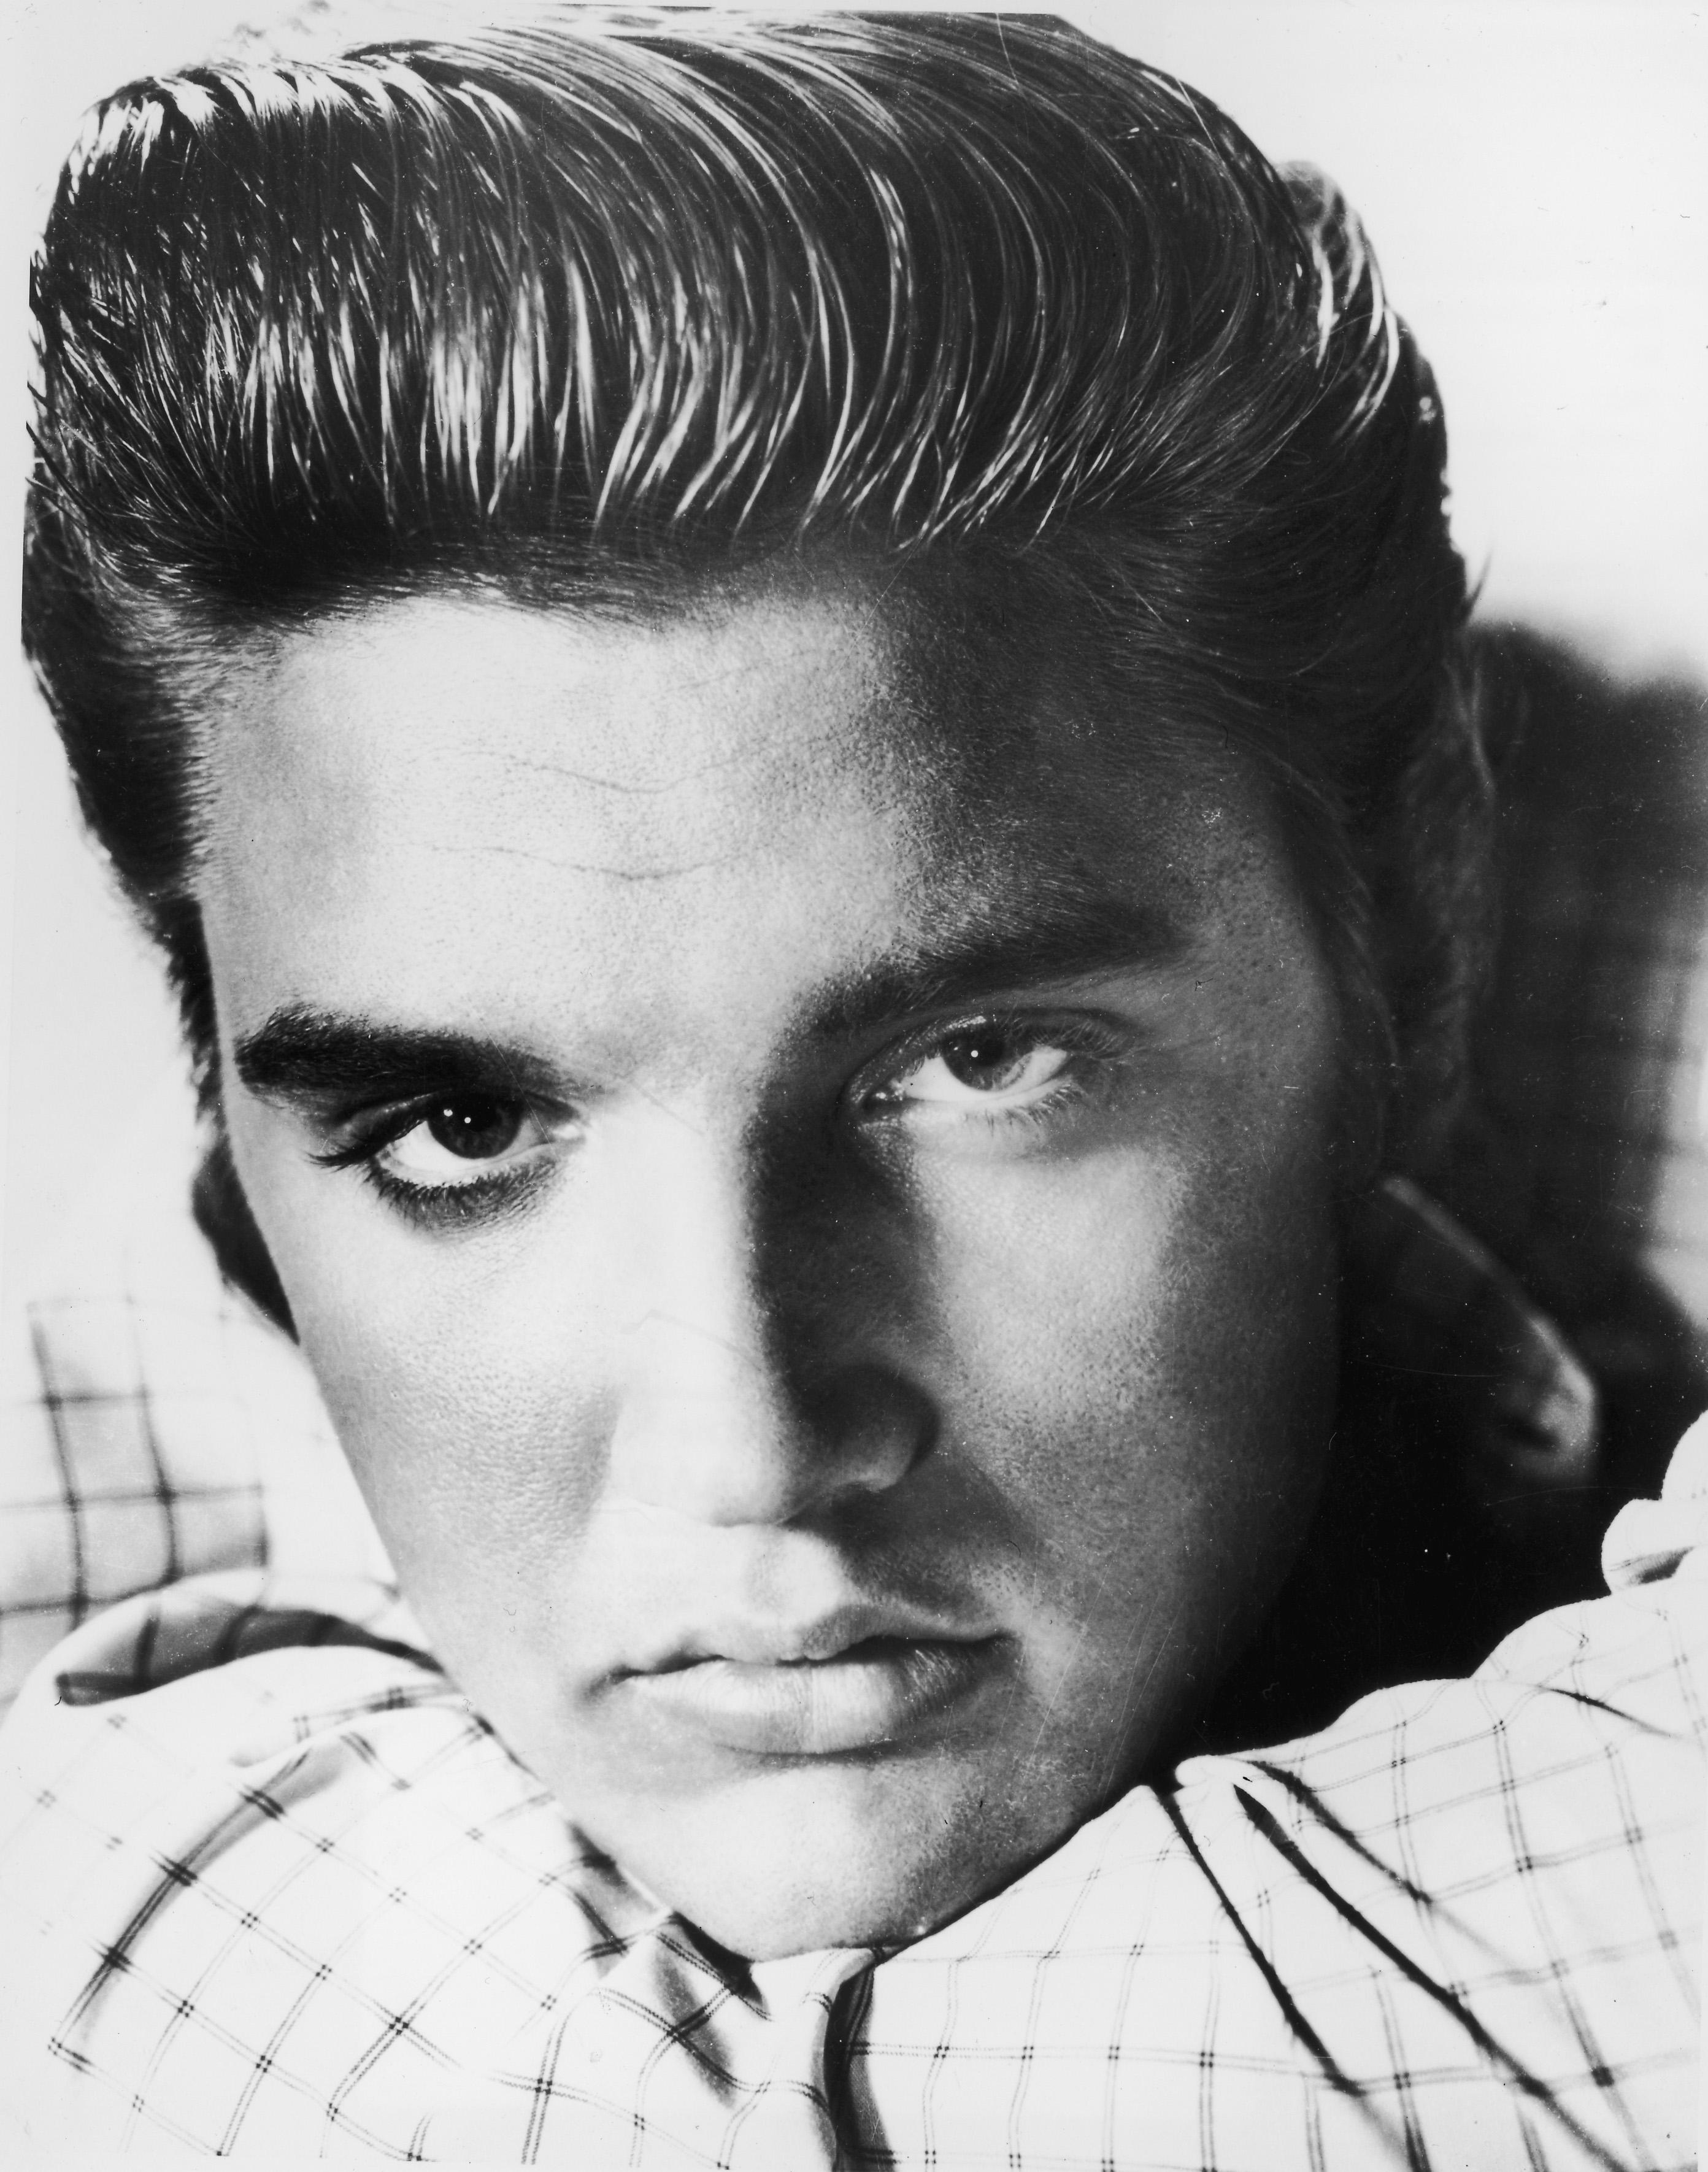 25th Anniversary Of Elvis Death